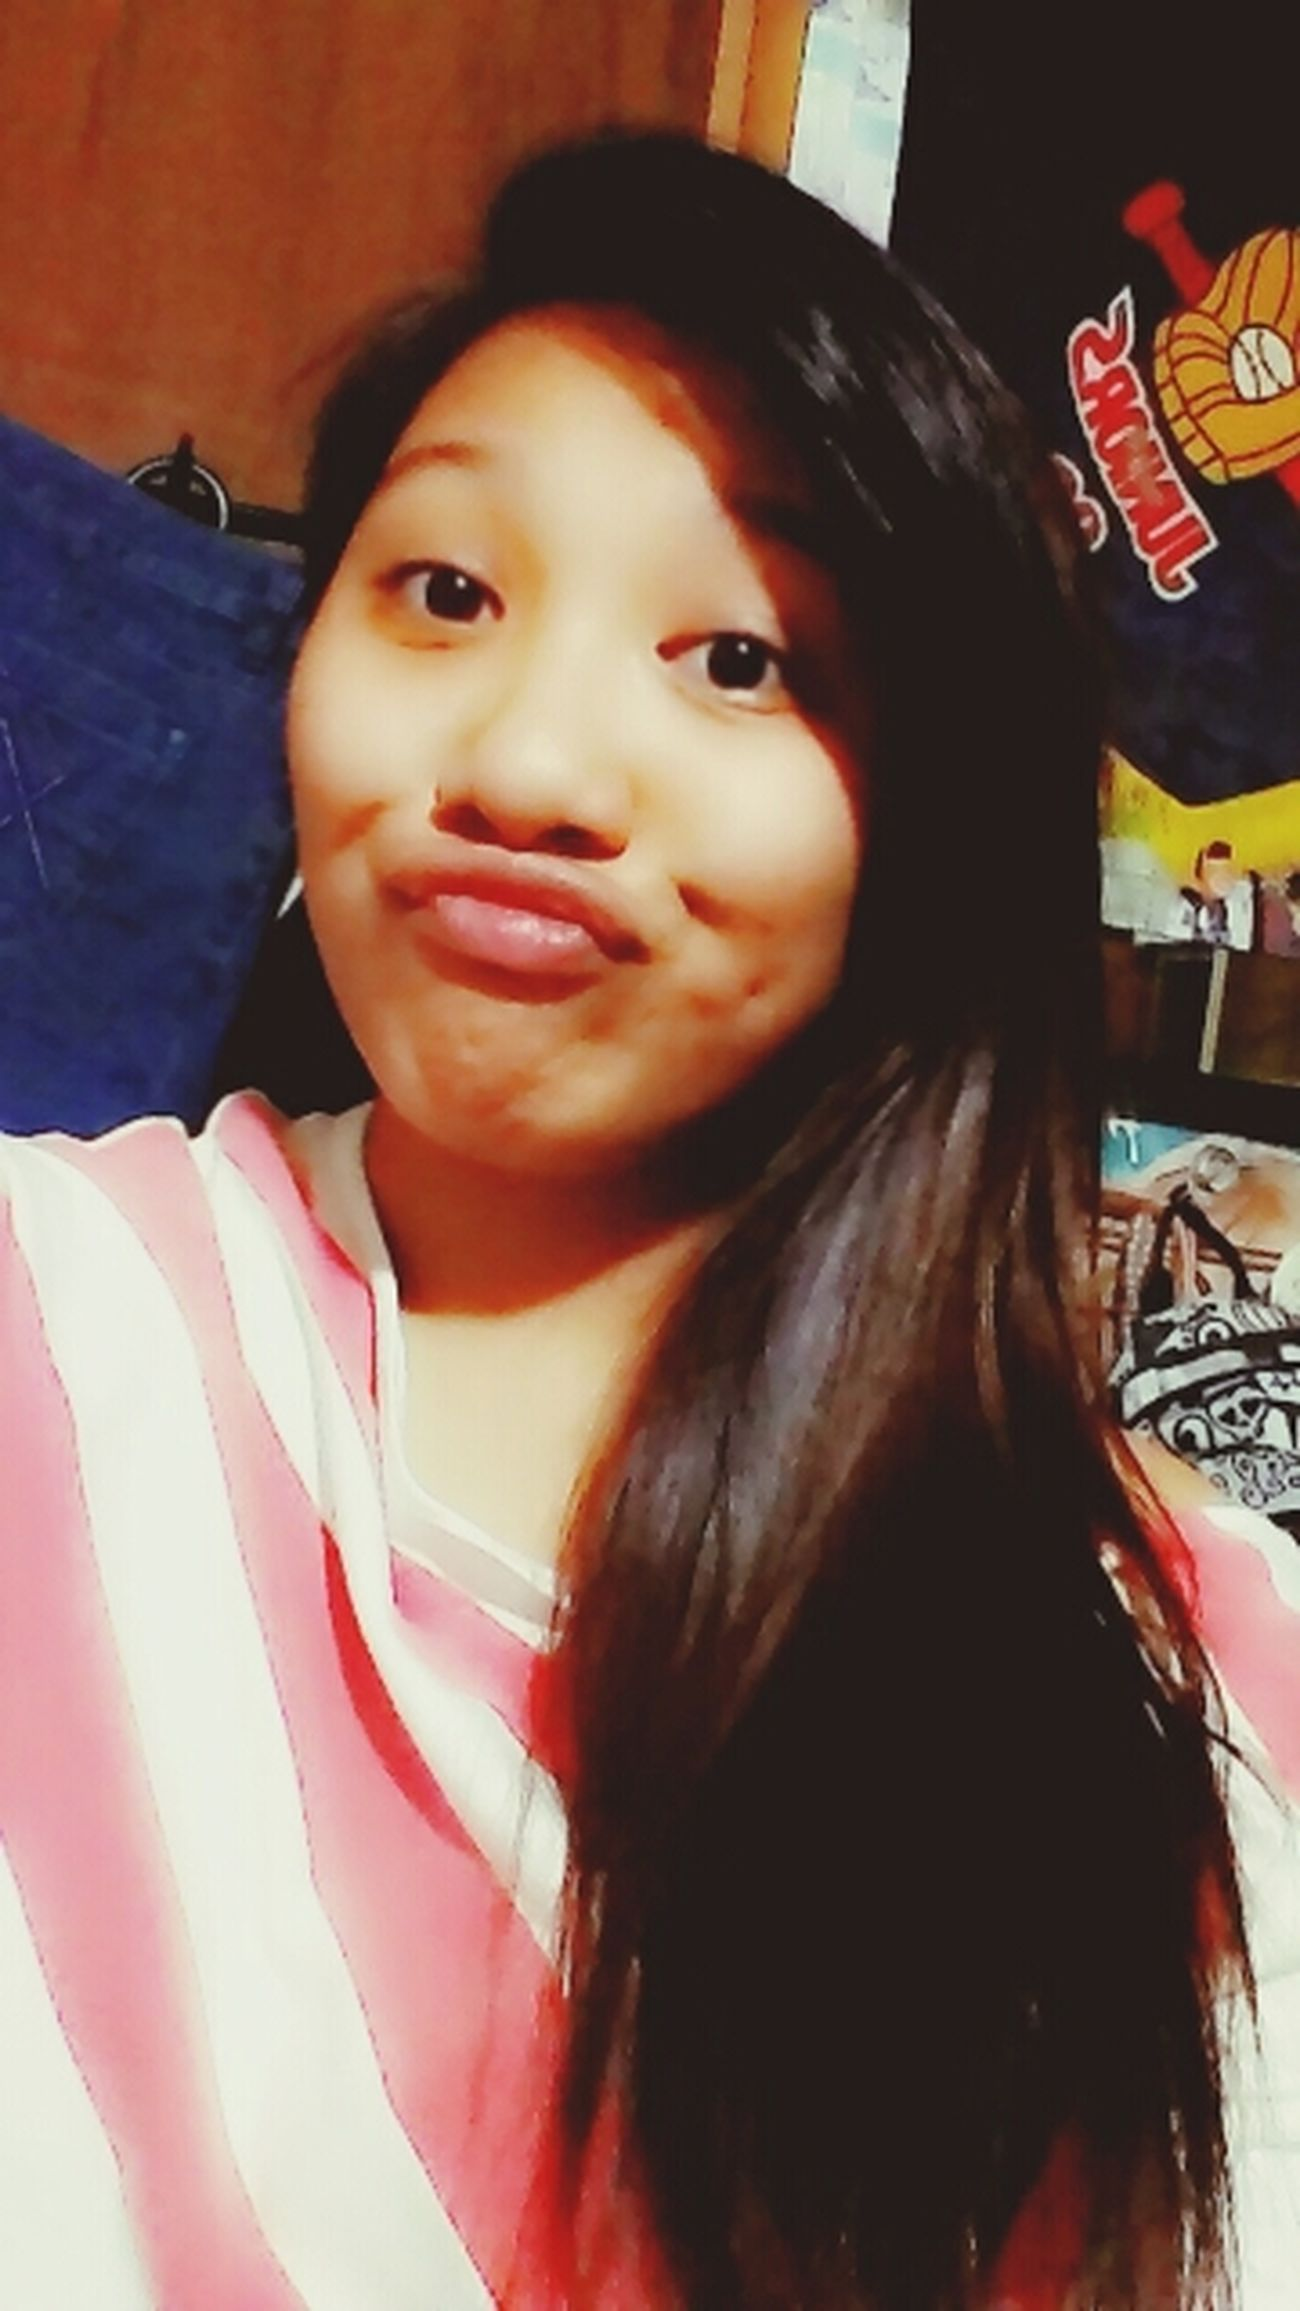 Pout:* Boring #me #follow #me ;) and I Miss U